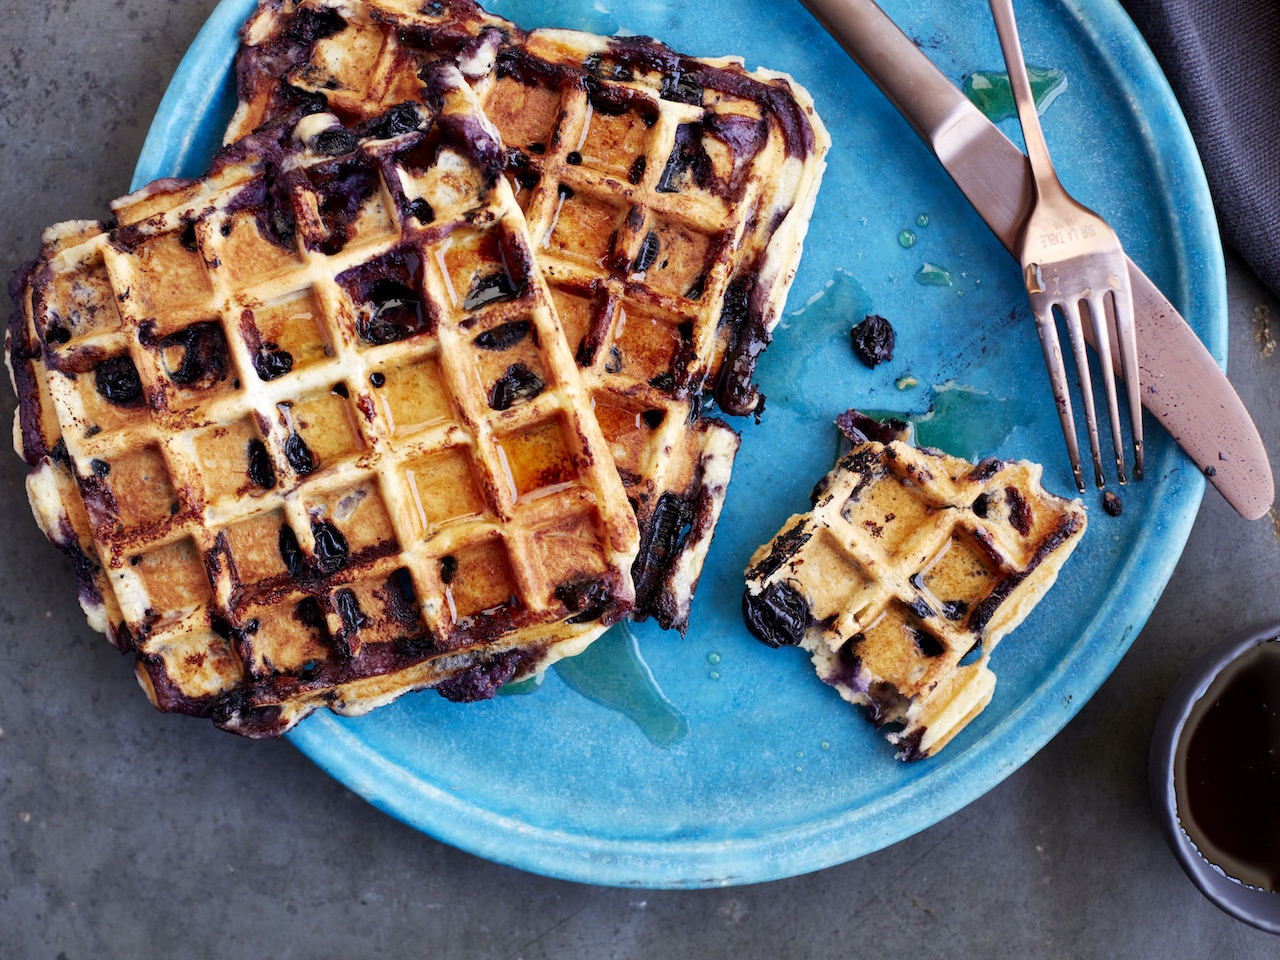 20160719_DrJulia_Blueberry-Waffles026 copy.jpg